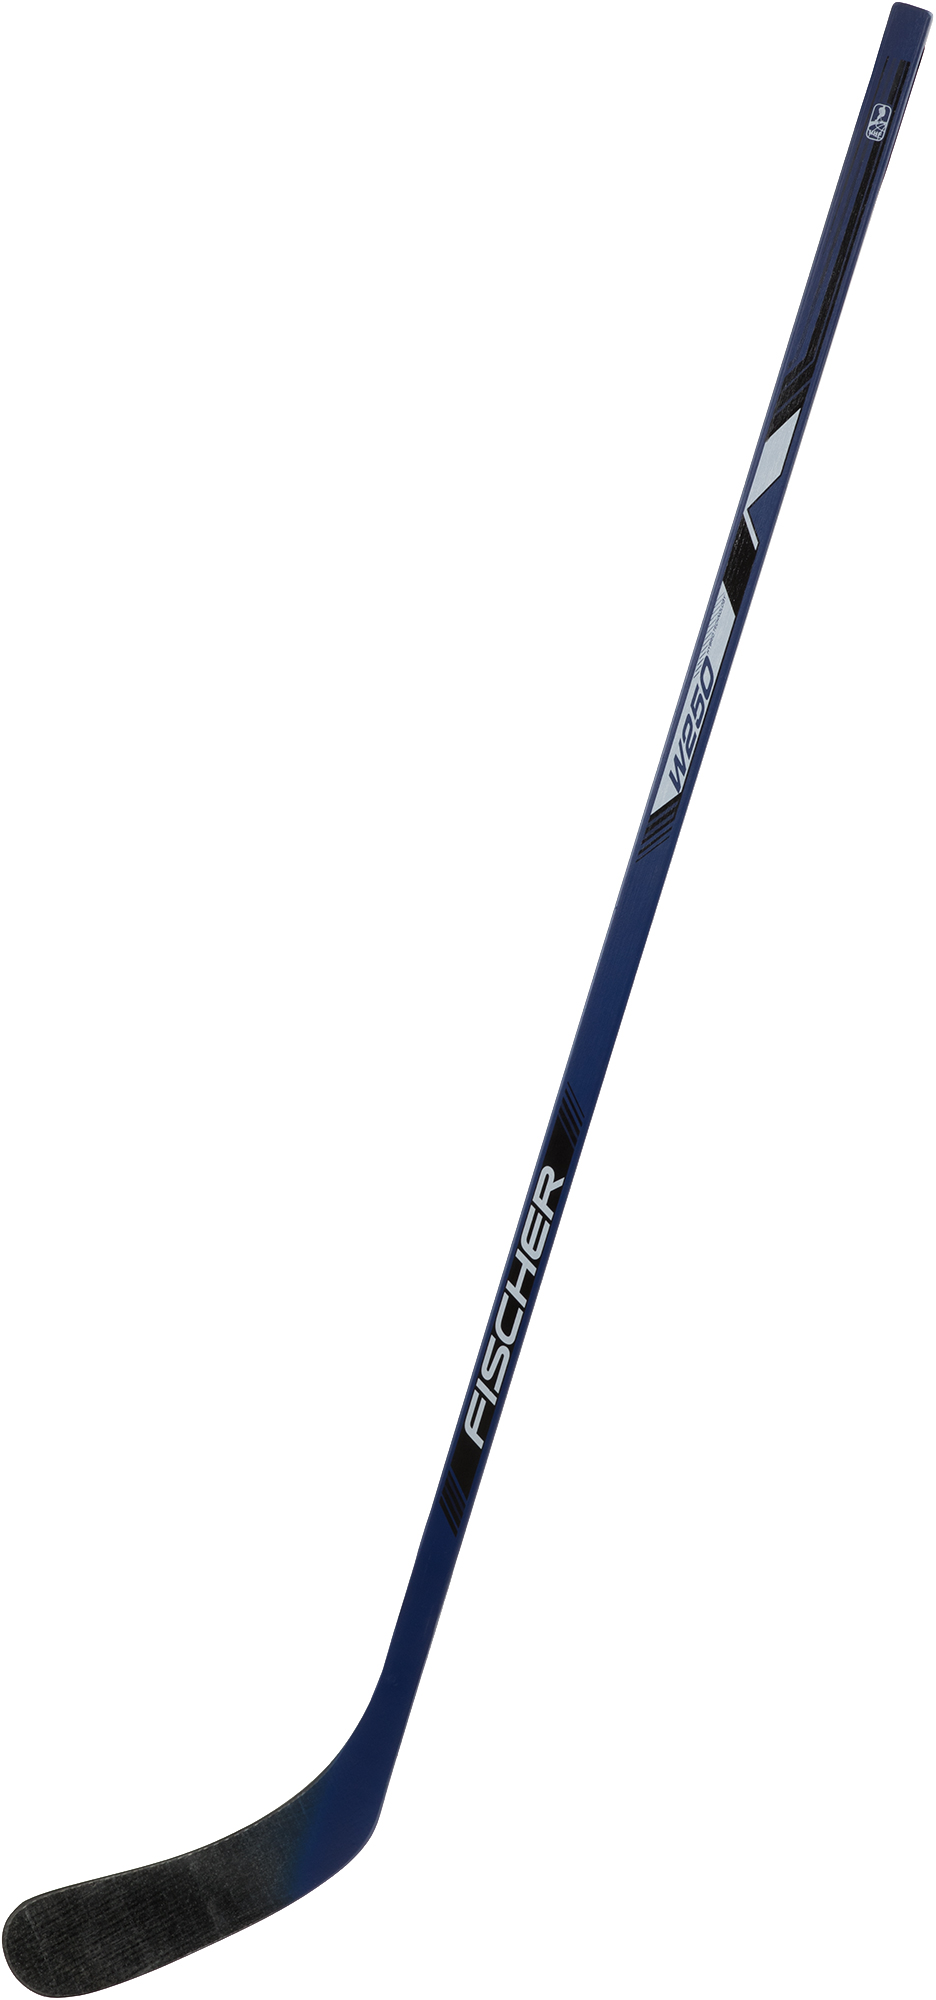 Fischer Клюшка хоккейная детская Fischer W250, размер R все цены